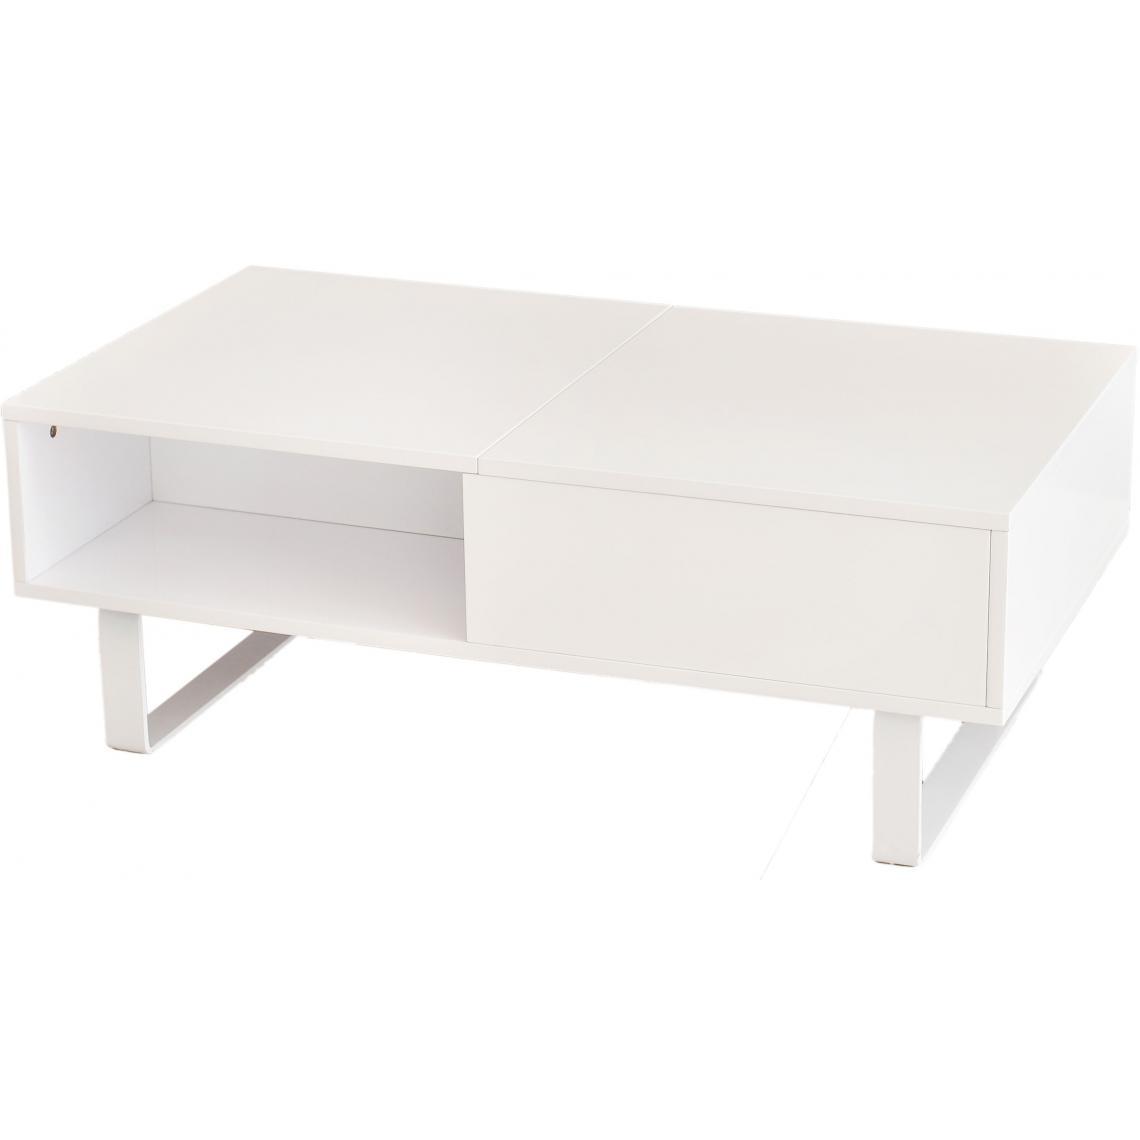 table basse blanche avec plateau relevable melvin 3 suisses. Black Bedroom Furniture Sets. Home Design Ideas